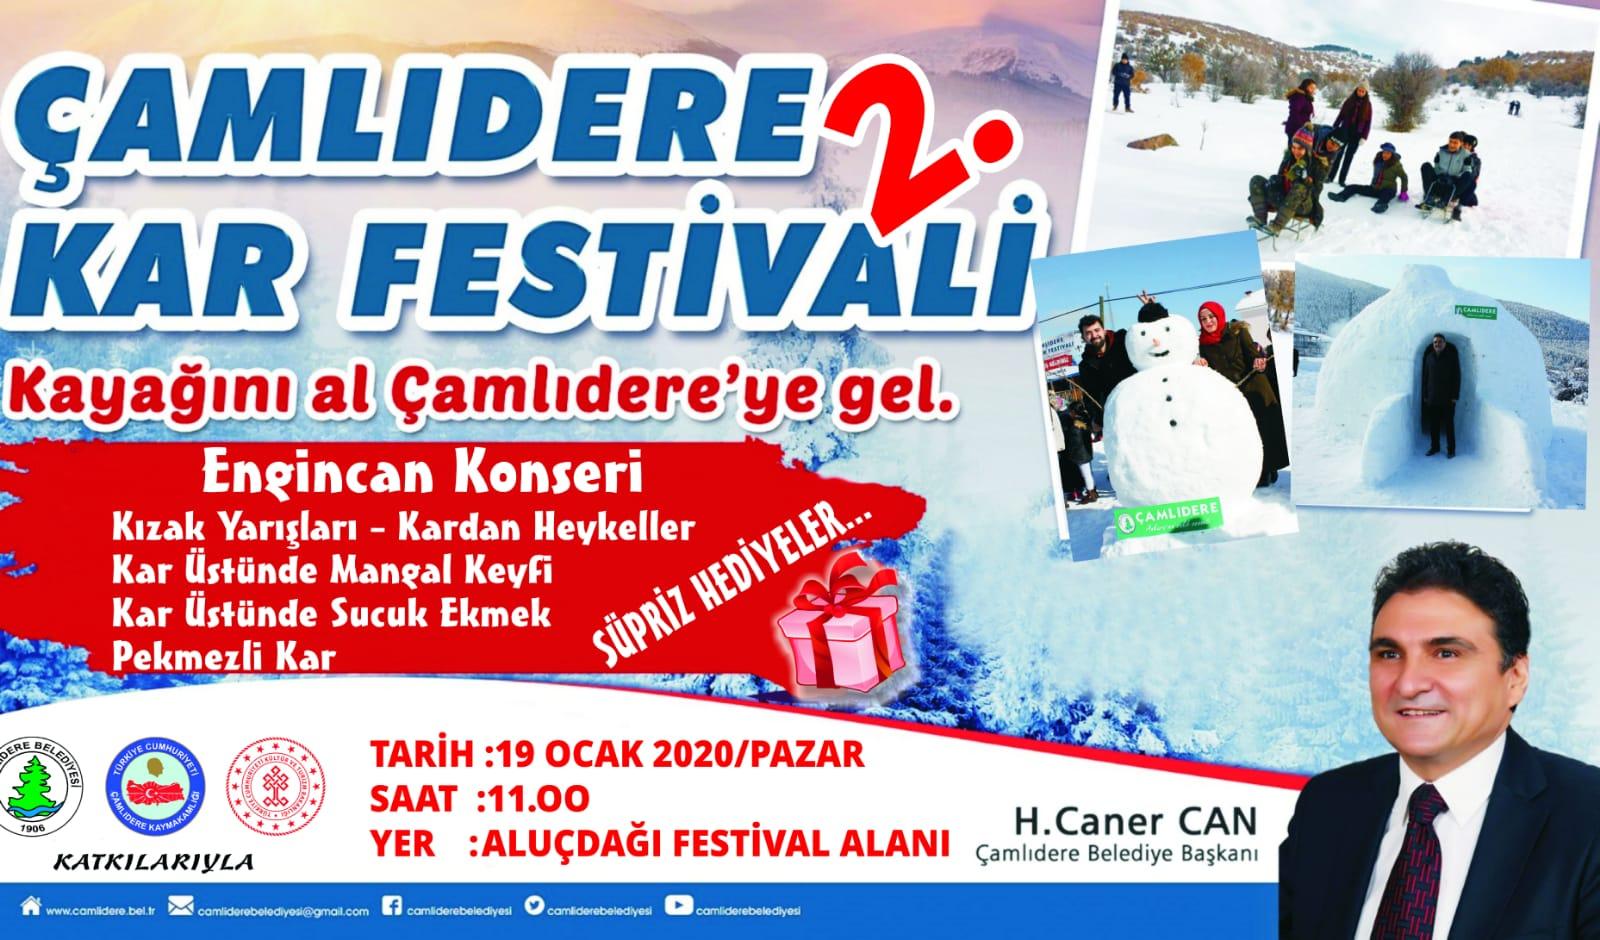 camlidere-kar-festivali-998